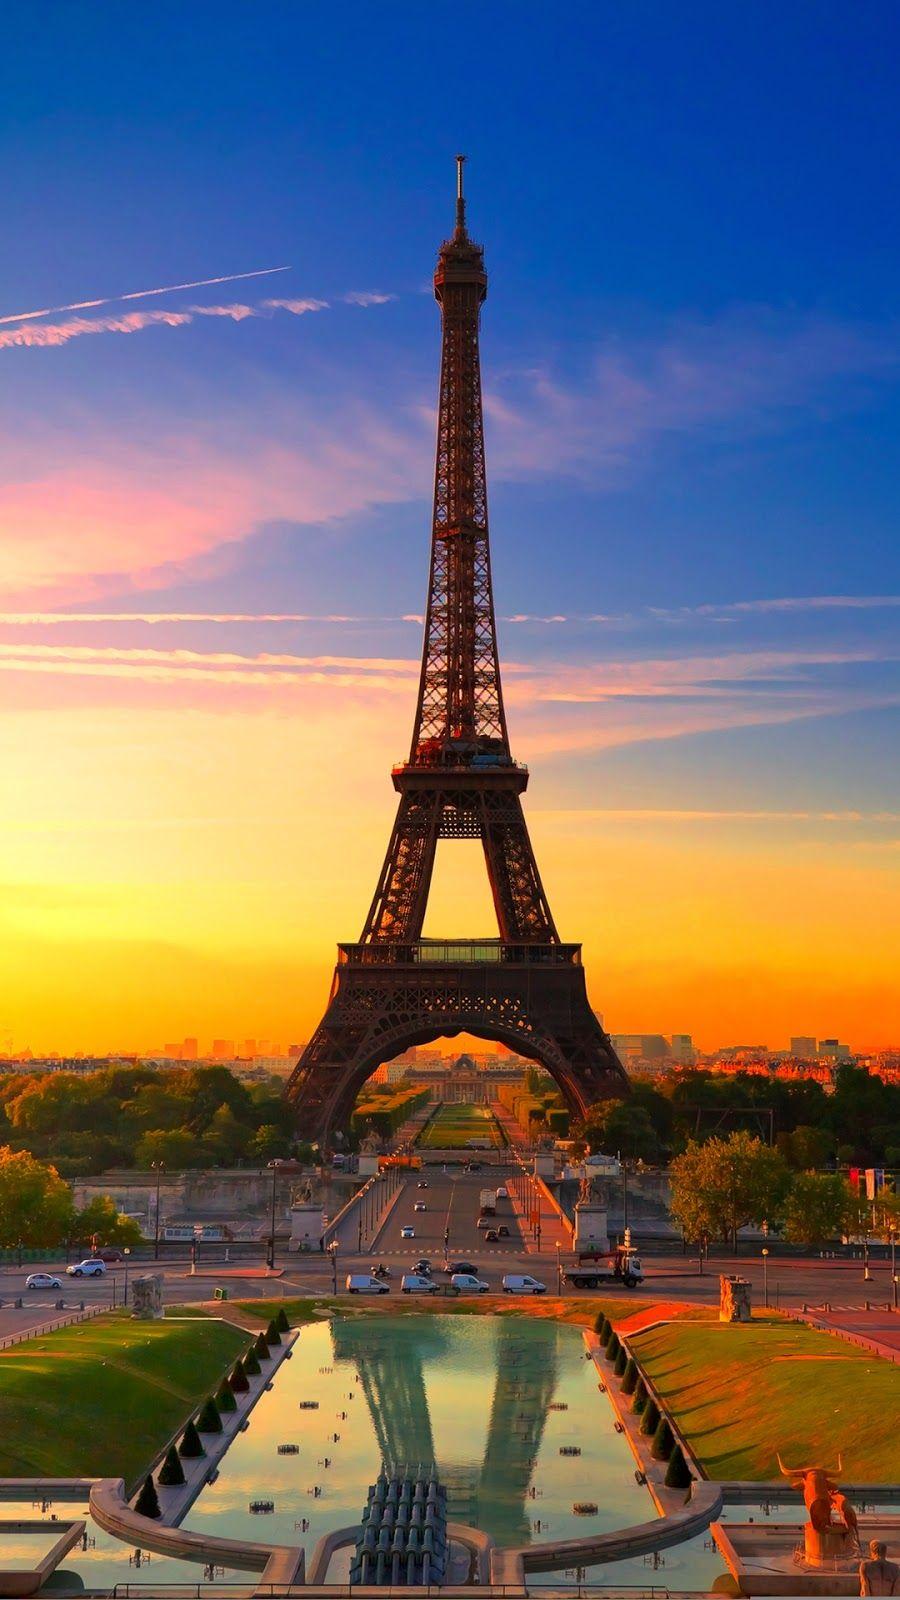 Best Hd Wallpaper Iphone 6 Plus In Wallpaper Windows 8 With Hd Wallpaper Iphone 6 Plus Download Hd Wallpaper France Eiffel Tower Paris Eiffel Tower